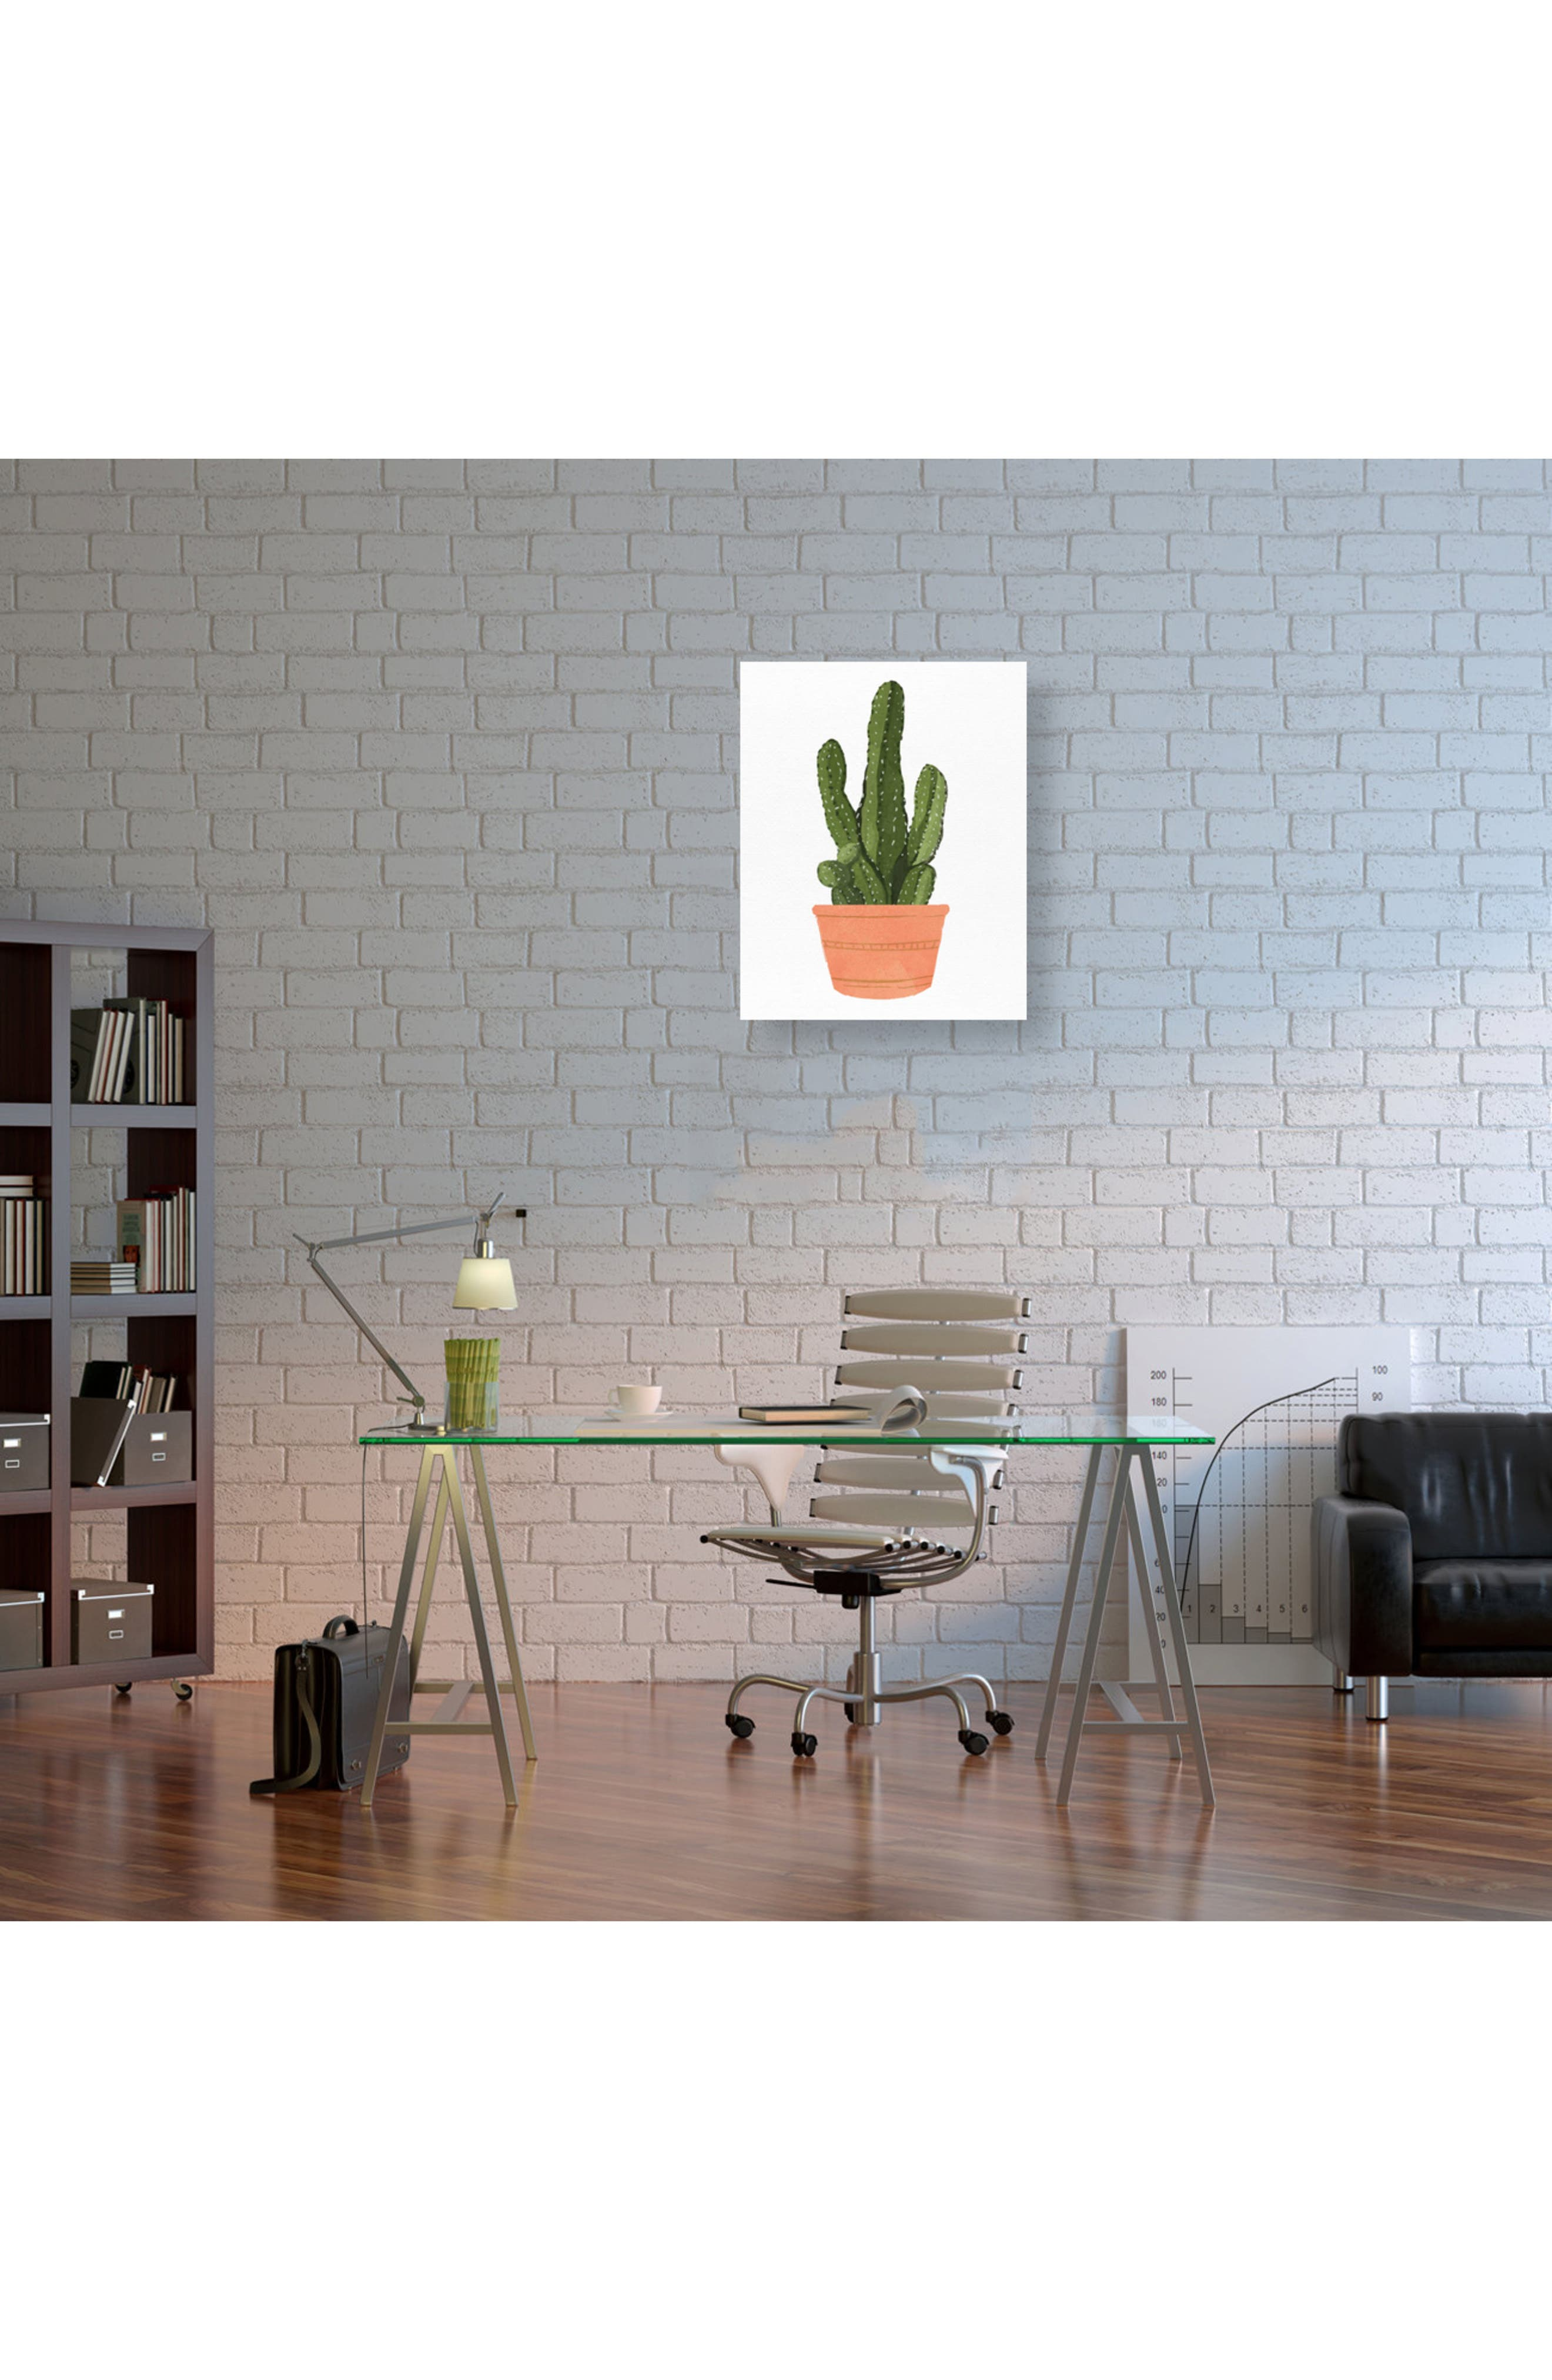 Cactus Coral III Canvas Wall Art,                             Alternate thumbnail 2, color,                             Green